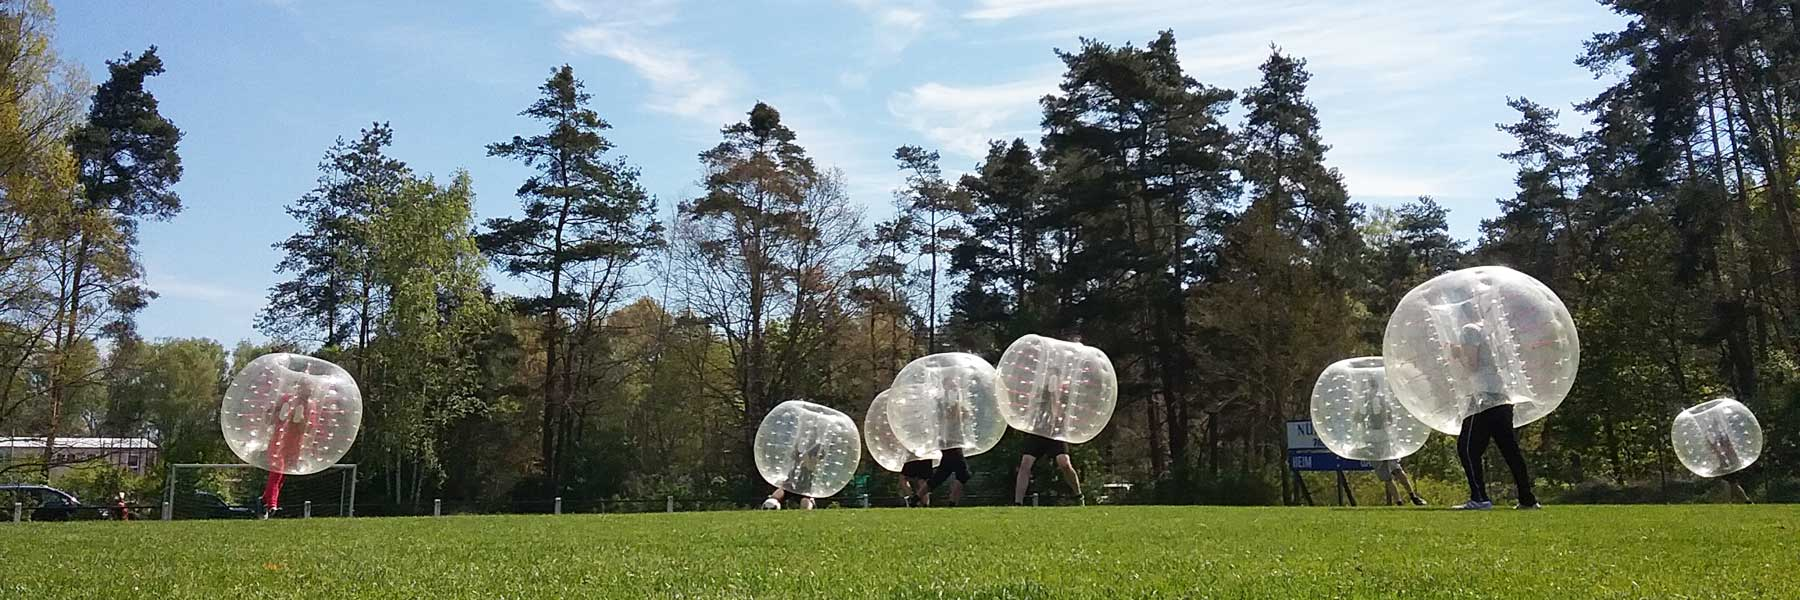 Bubble Soccer mit BodyZorbs®